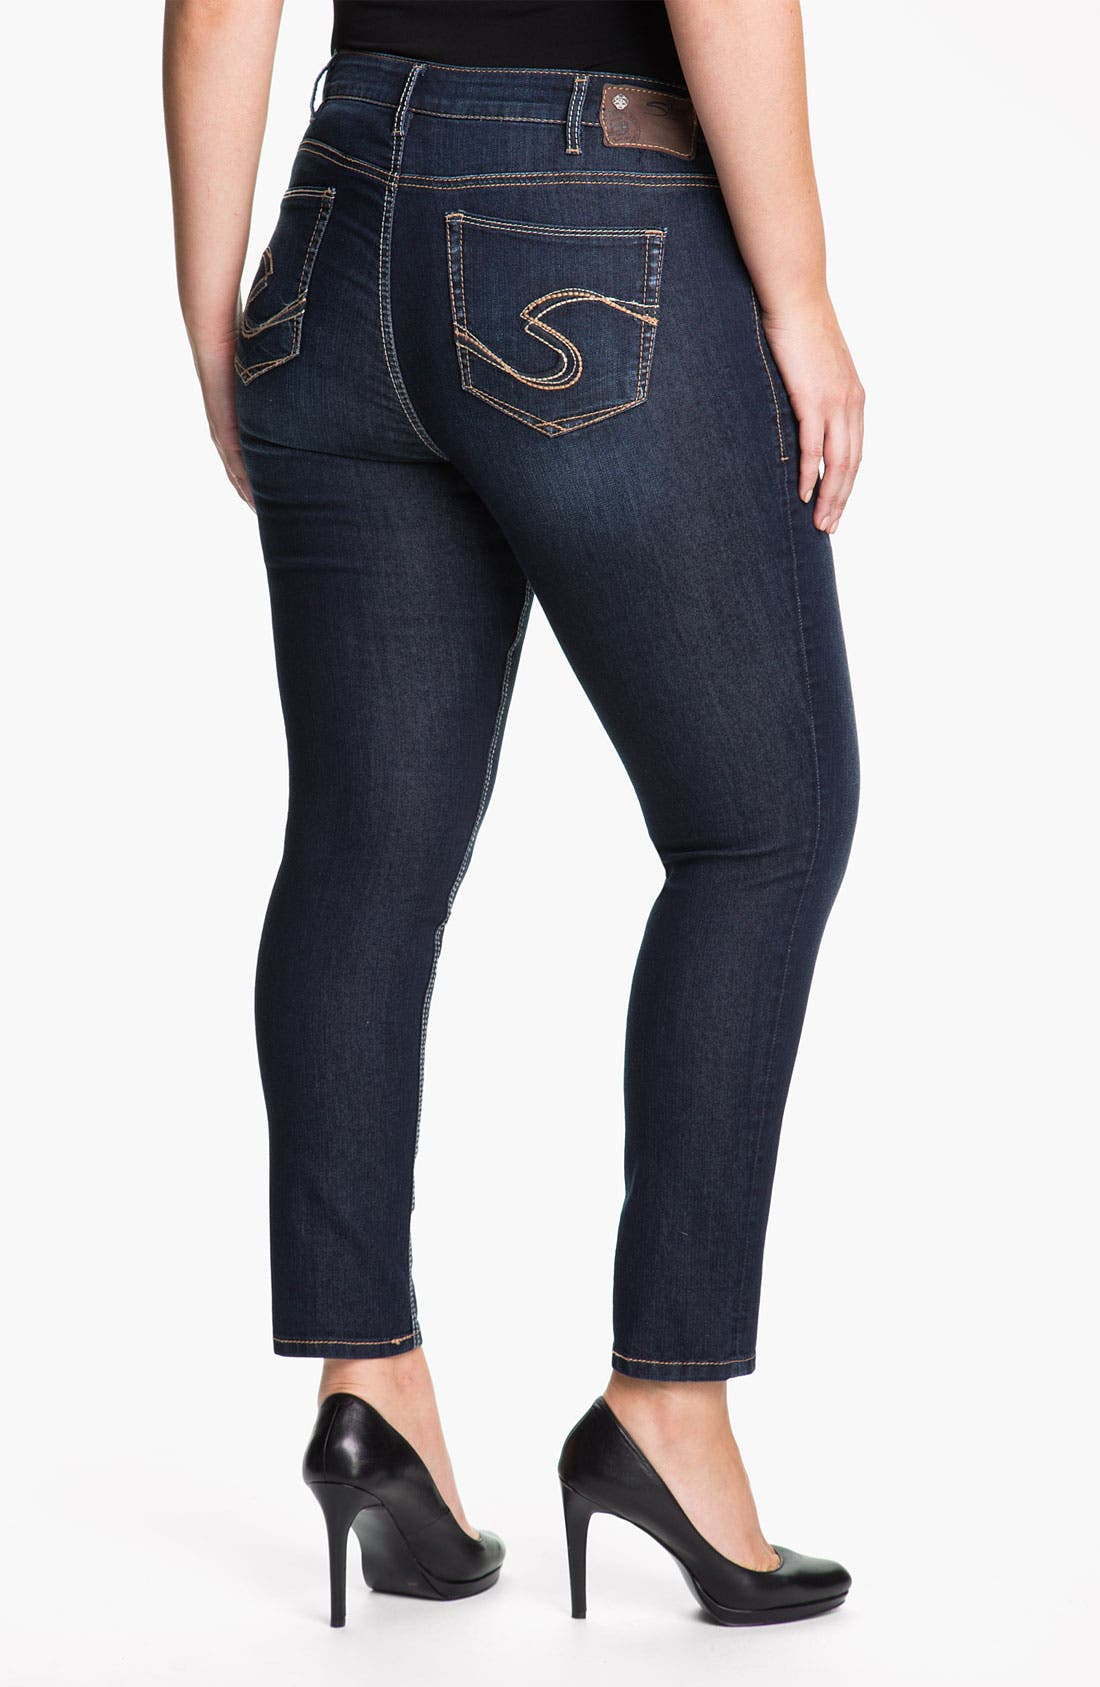 Alternate Image 2  - Silver Jeans Co. 'Suki' Stretch Denim Leggings (Plus)